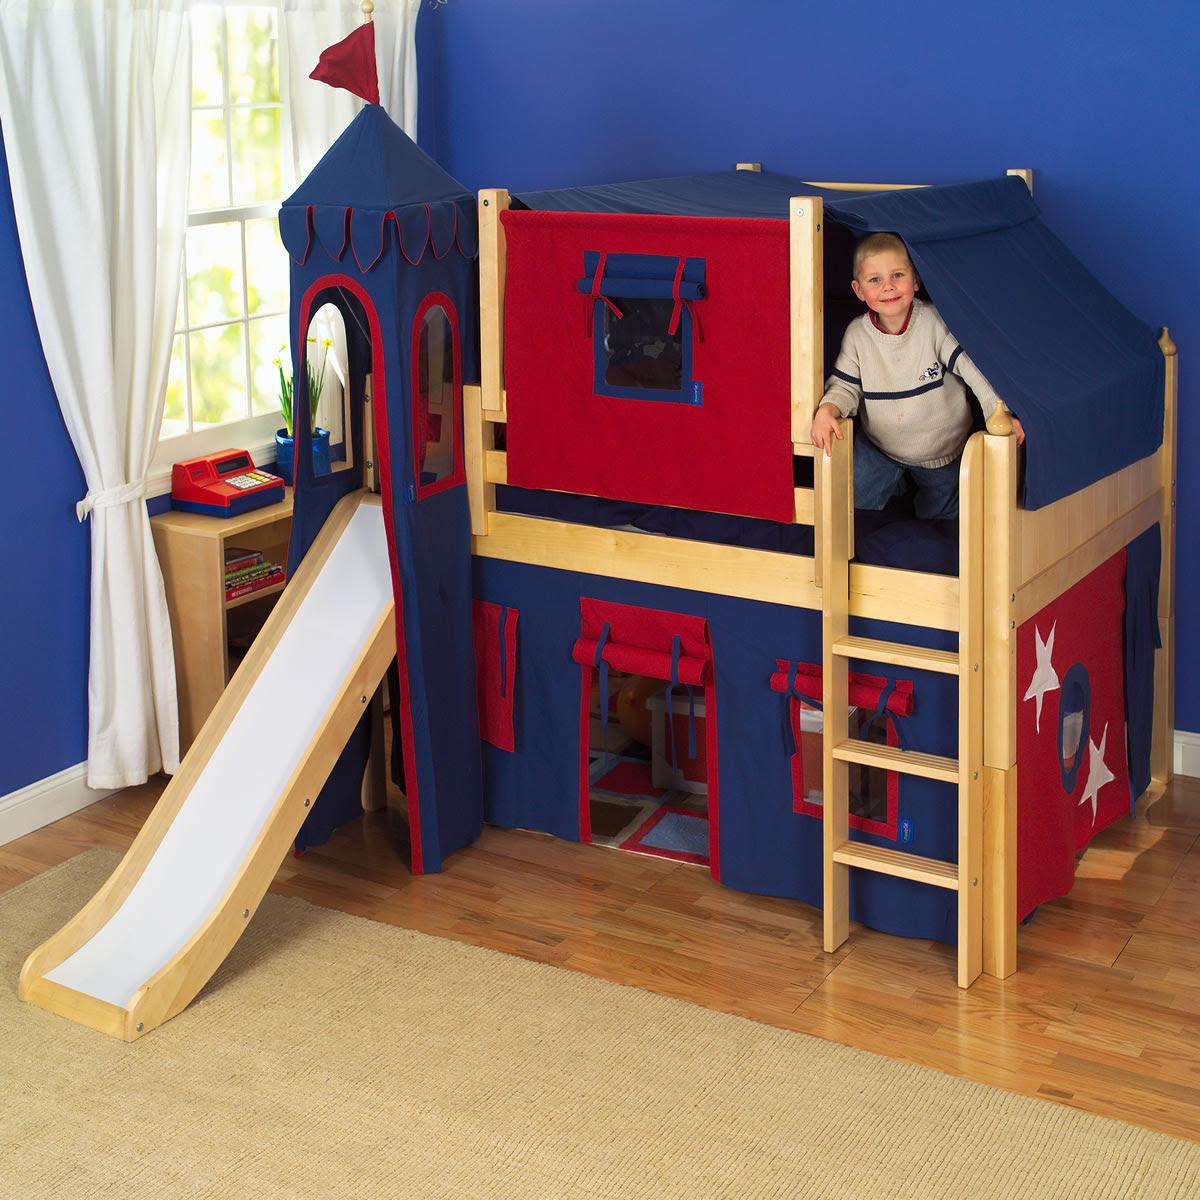 Maxtrix Kids Bunk Beds and Loft Beds